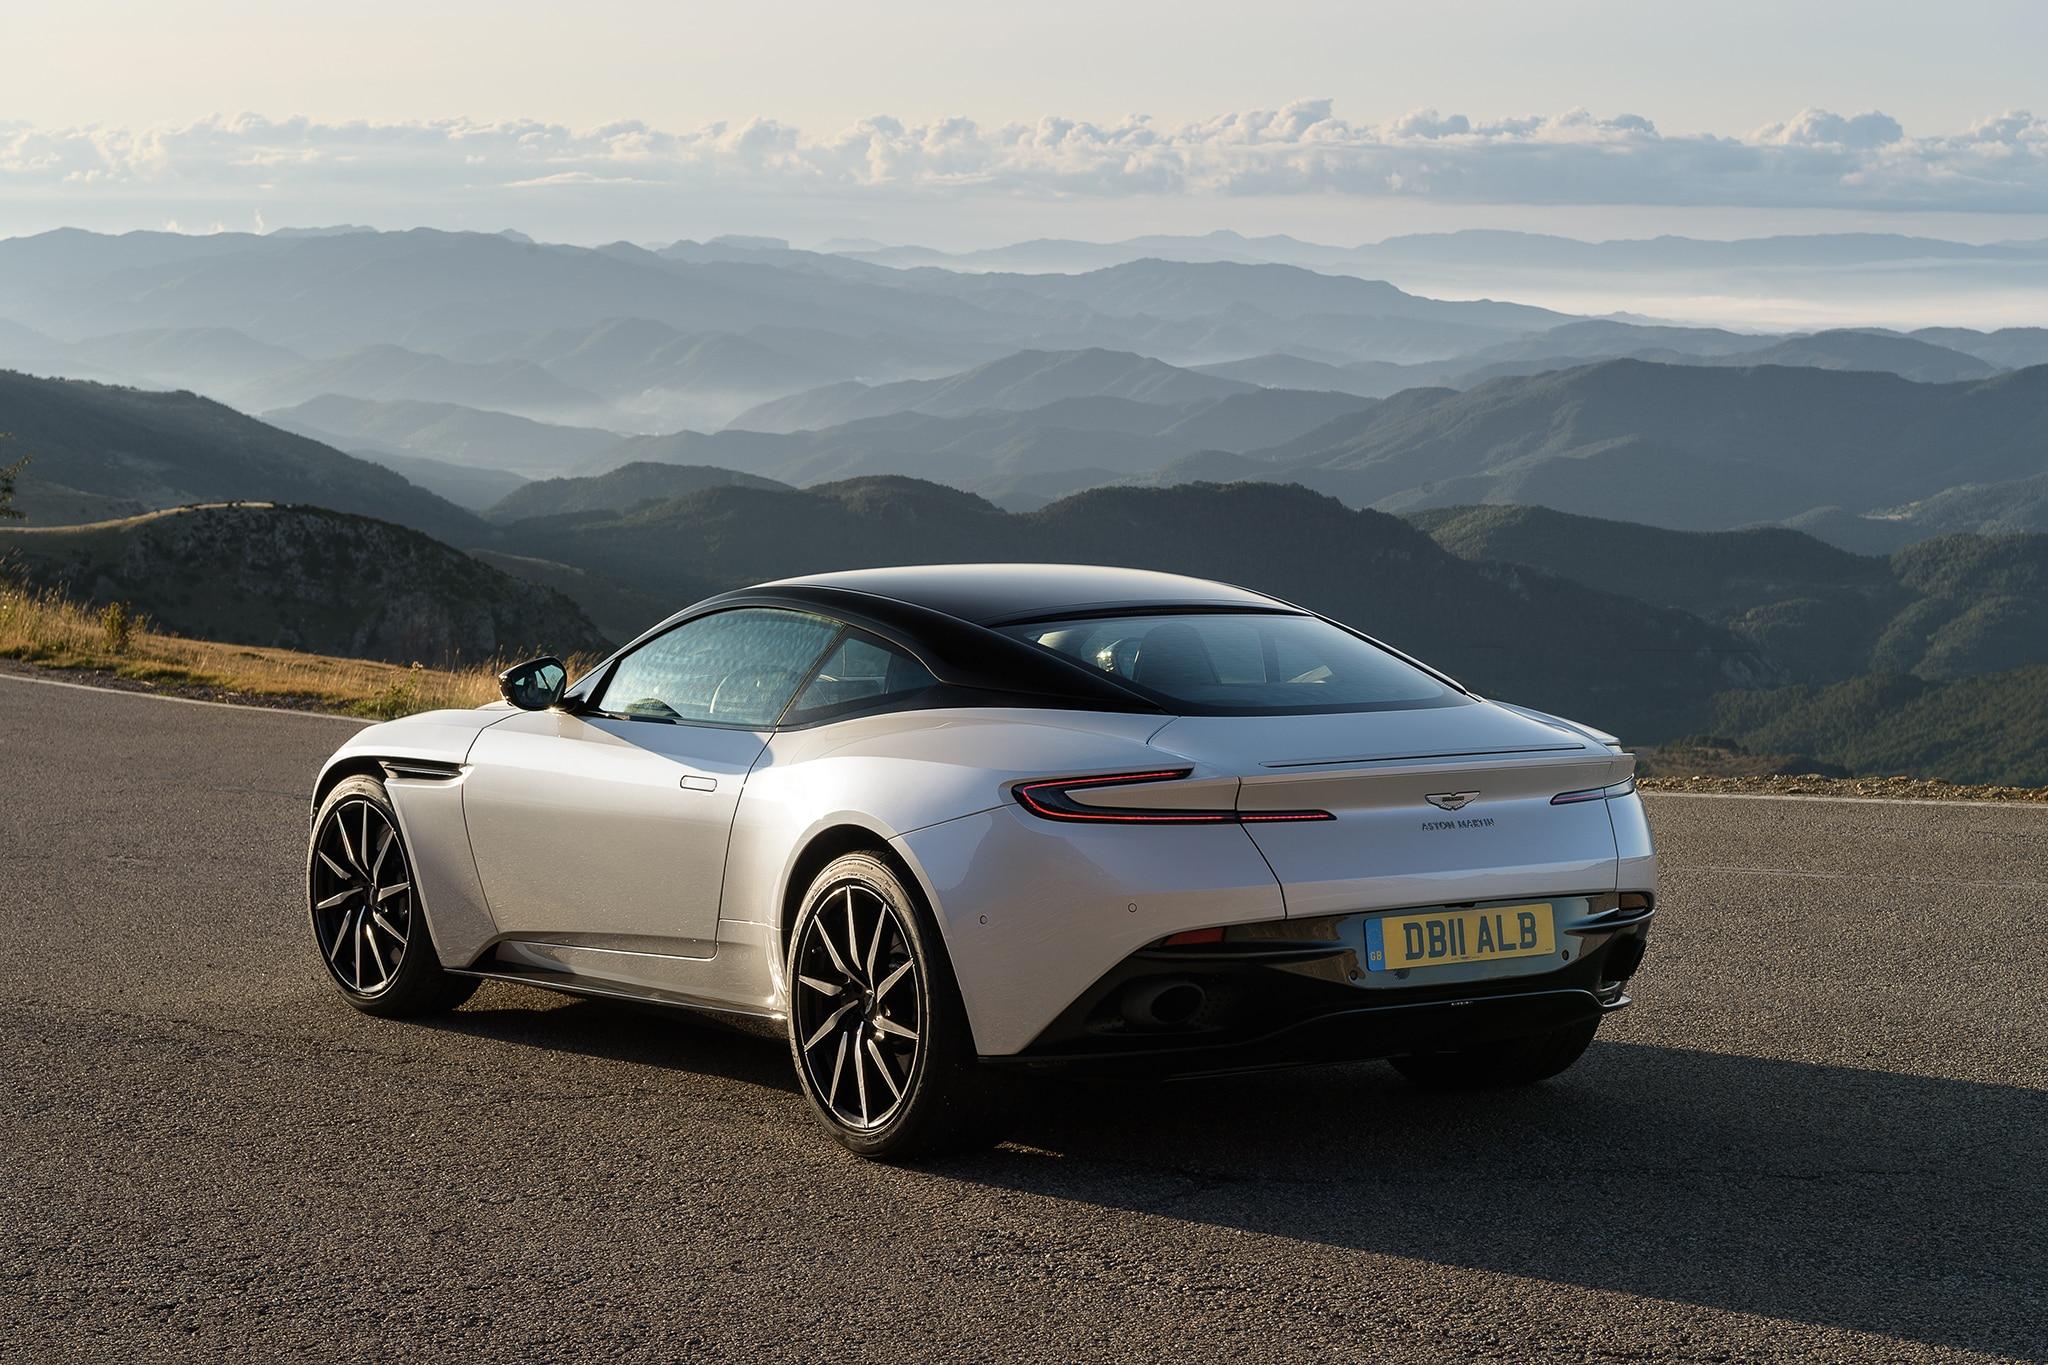 Aston Martin DB V First Drive Review Automobile Magazine - 2018 aston martin